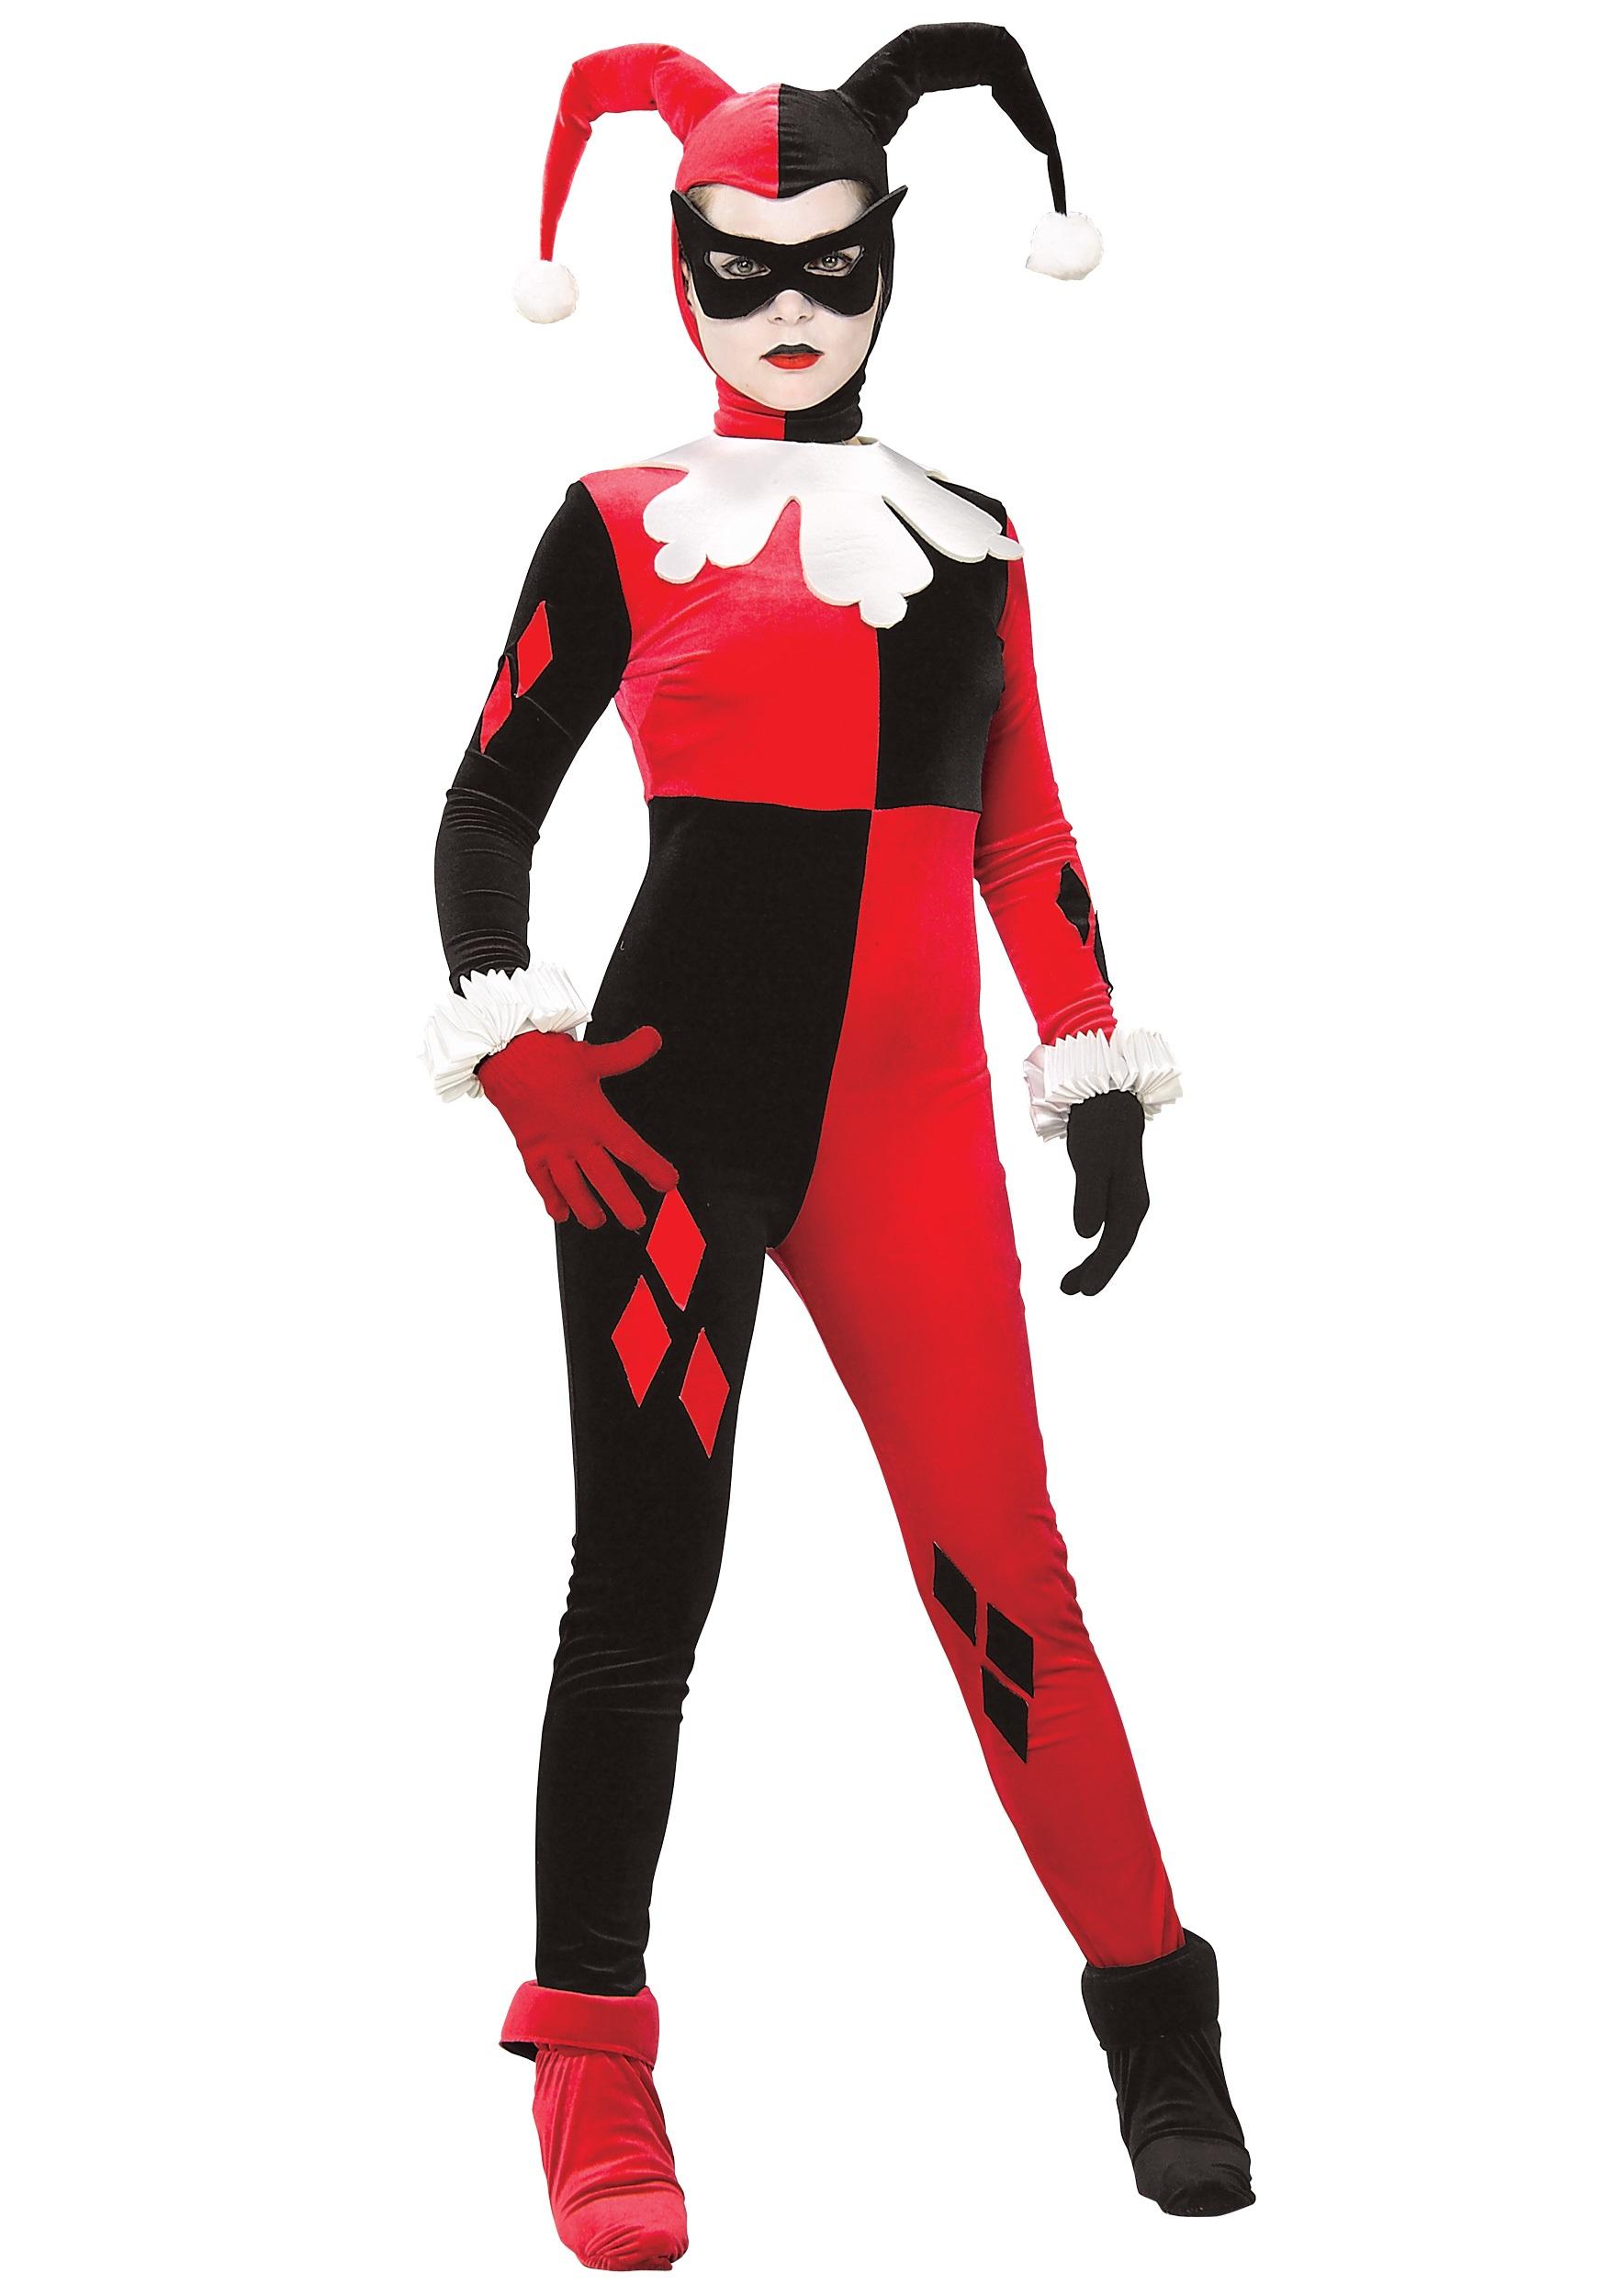 Halloween Joker And Harley Quinn Costumes.Harley Quinn Costumes Batman And Joker Costumes